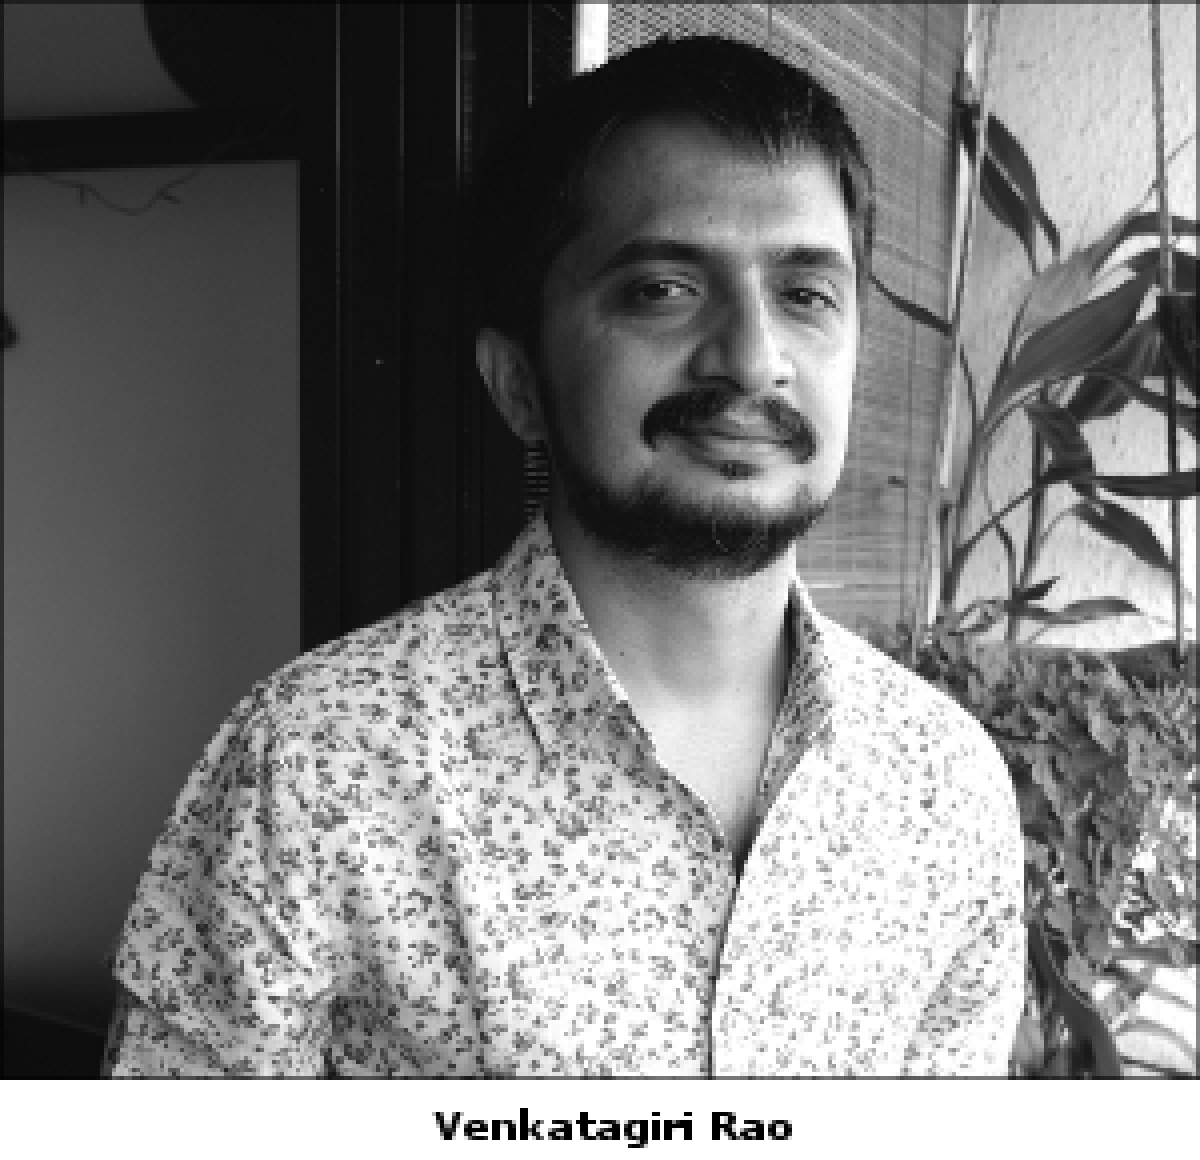 DDB's Venkatagiri Rao joins VML as creative head - India